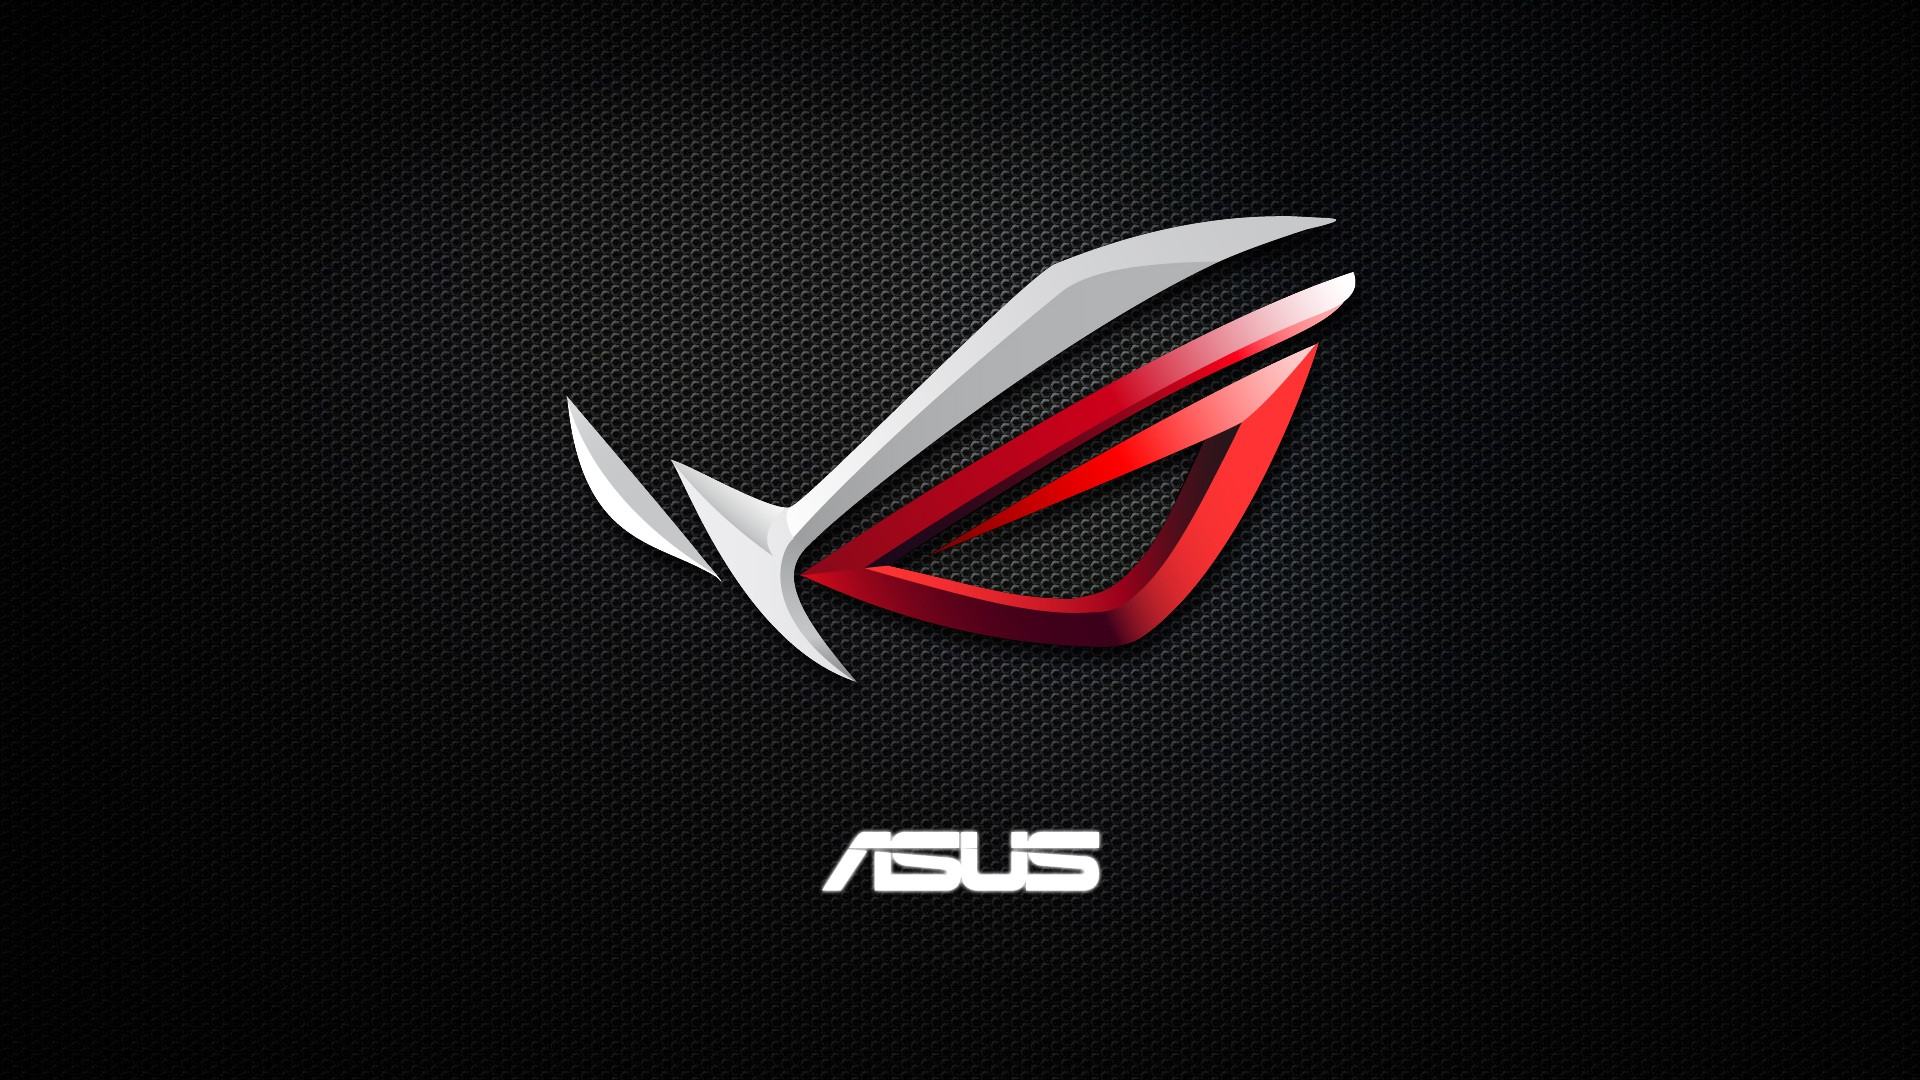 Asus Logos Wallpaper x Asus Logos 1920x1080